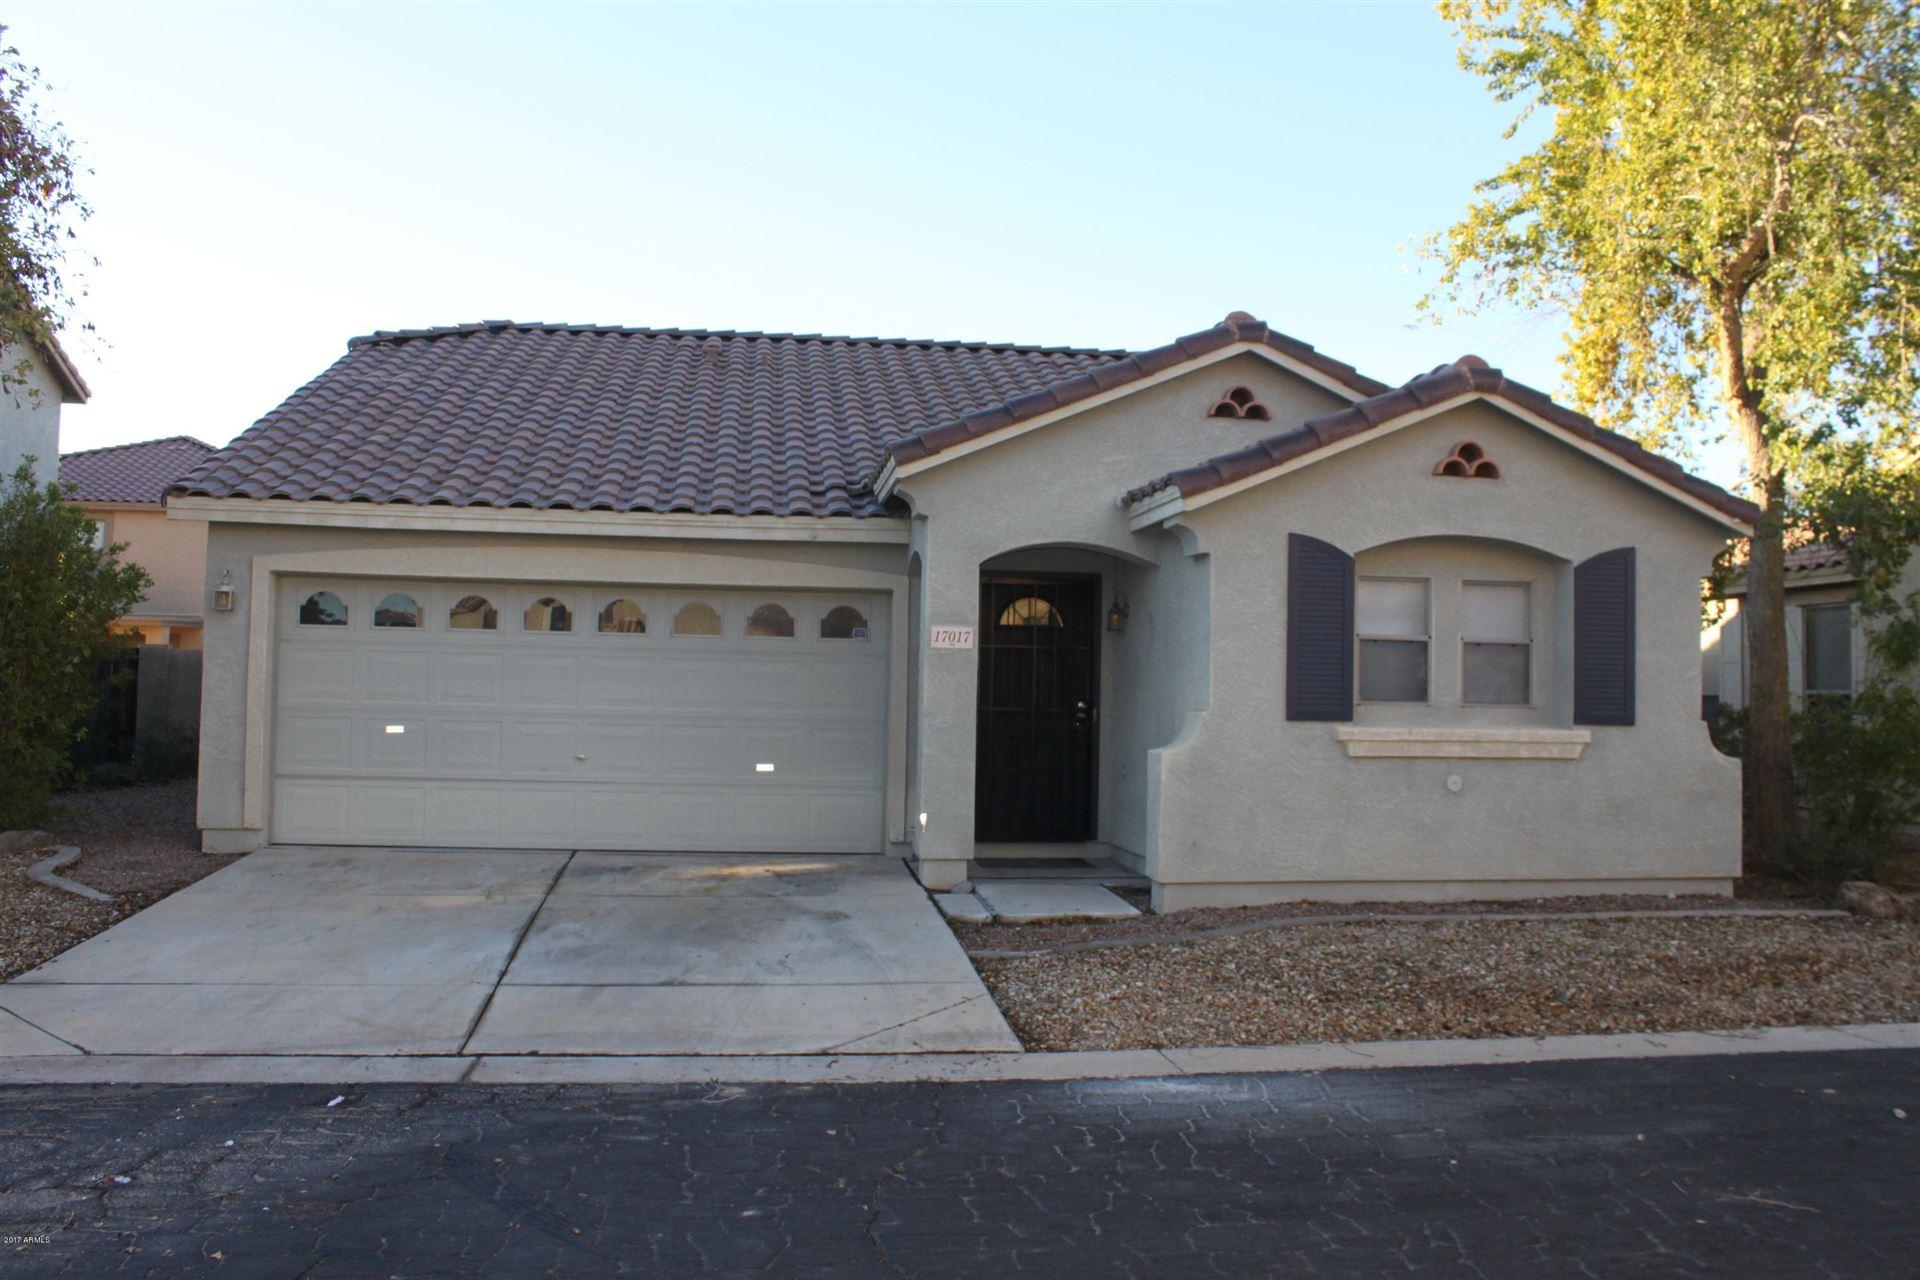 Photo of 17017 W RIMROCK Street, Surprise, AZ 85388 (MLS # 6200590)